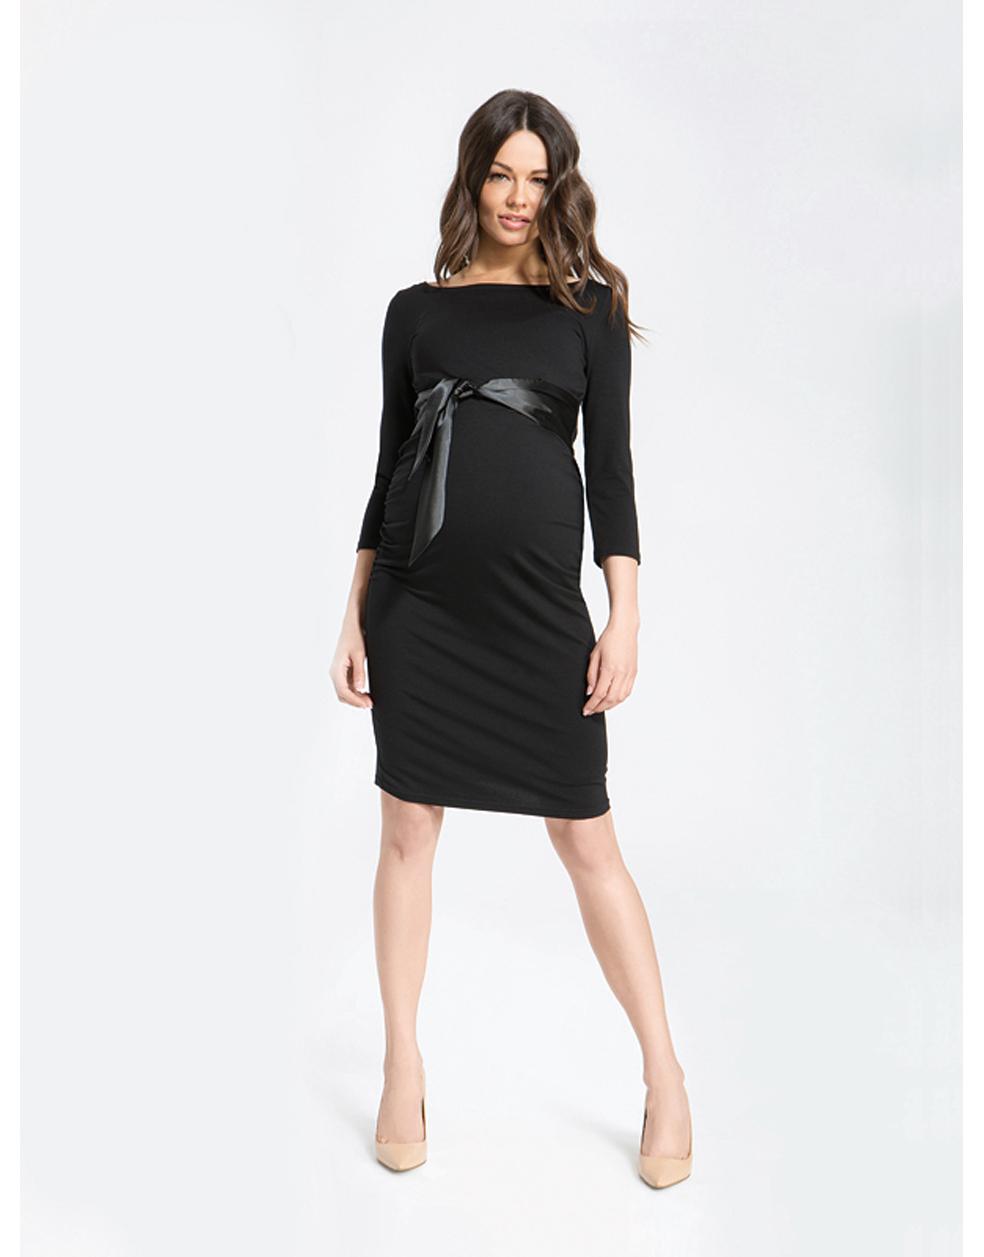 fa5142f5a9 Dacja Dress - hautemama